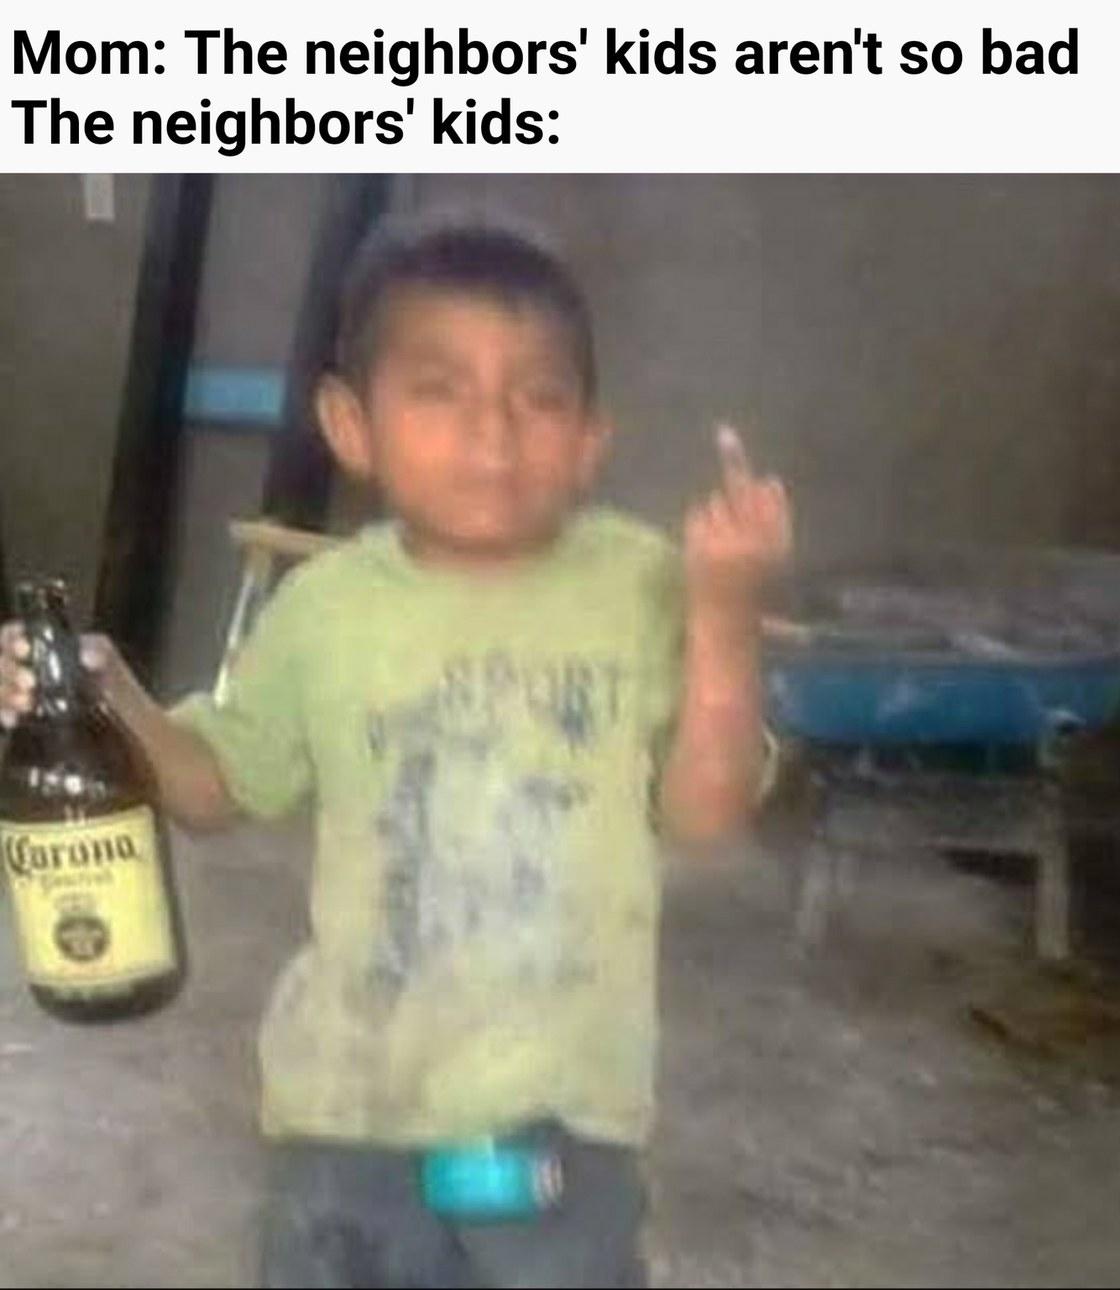 The neighbors' kids - meme